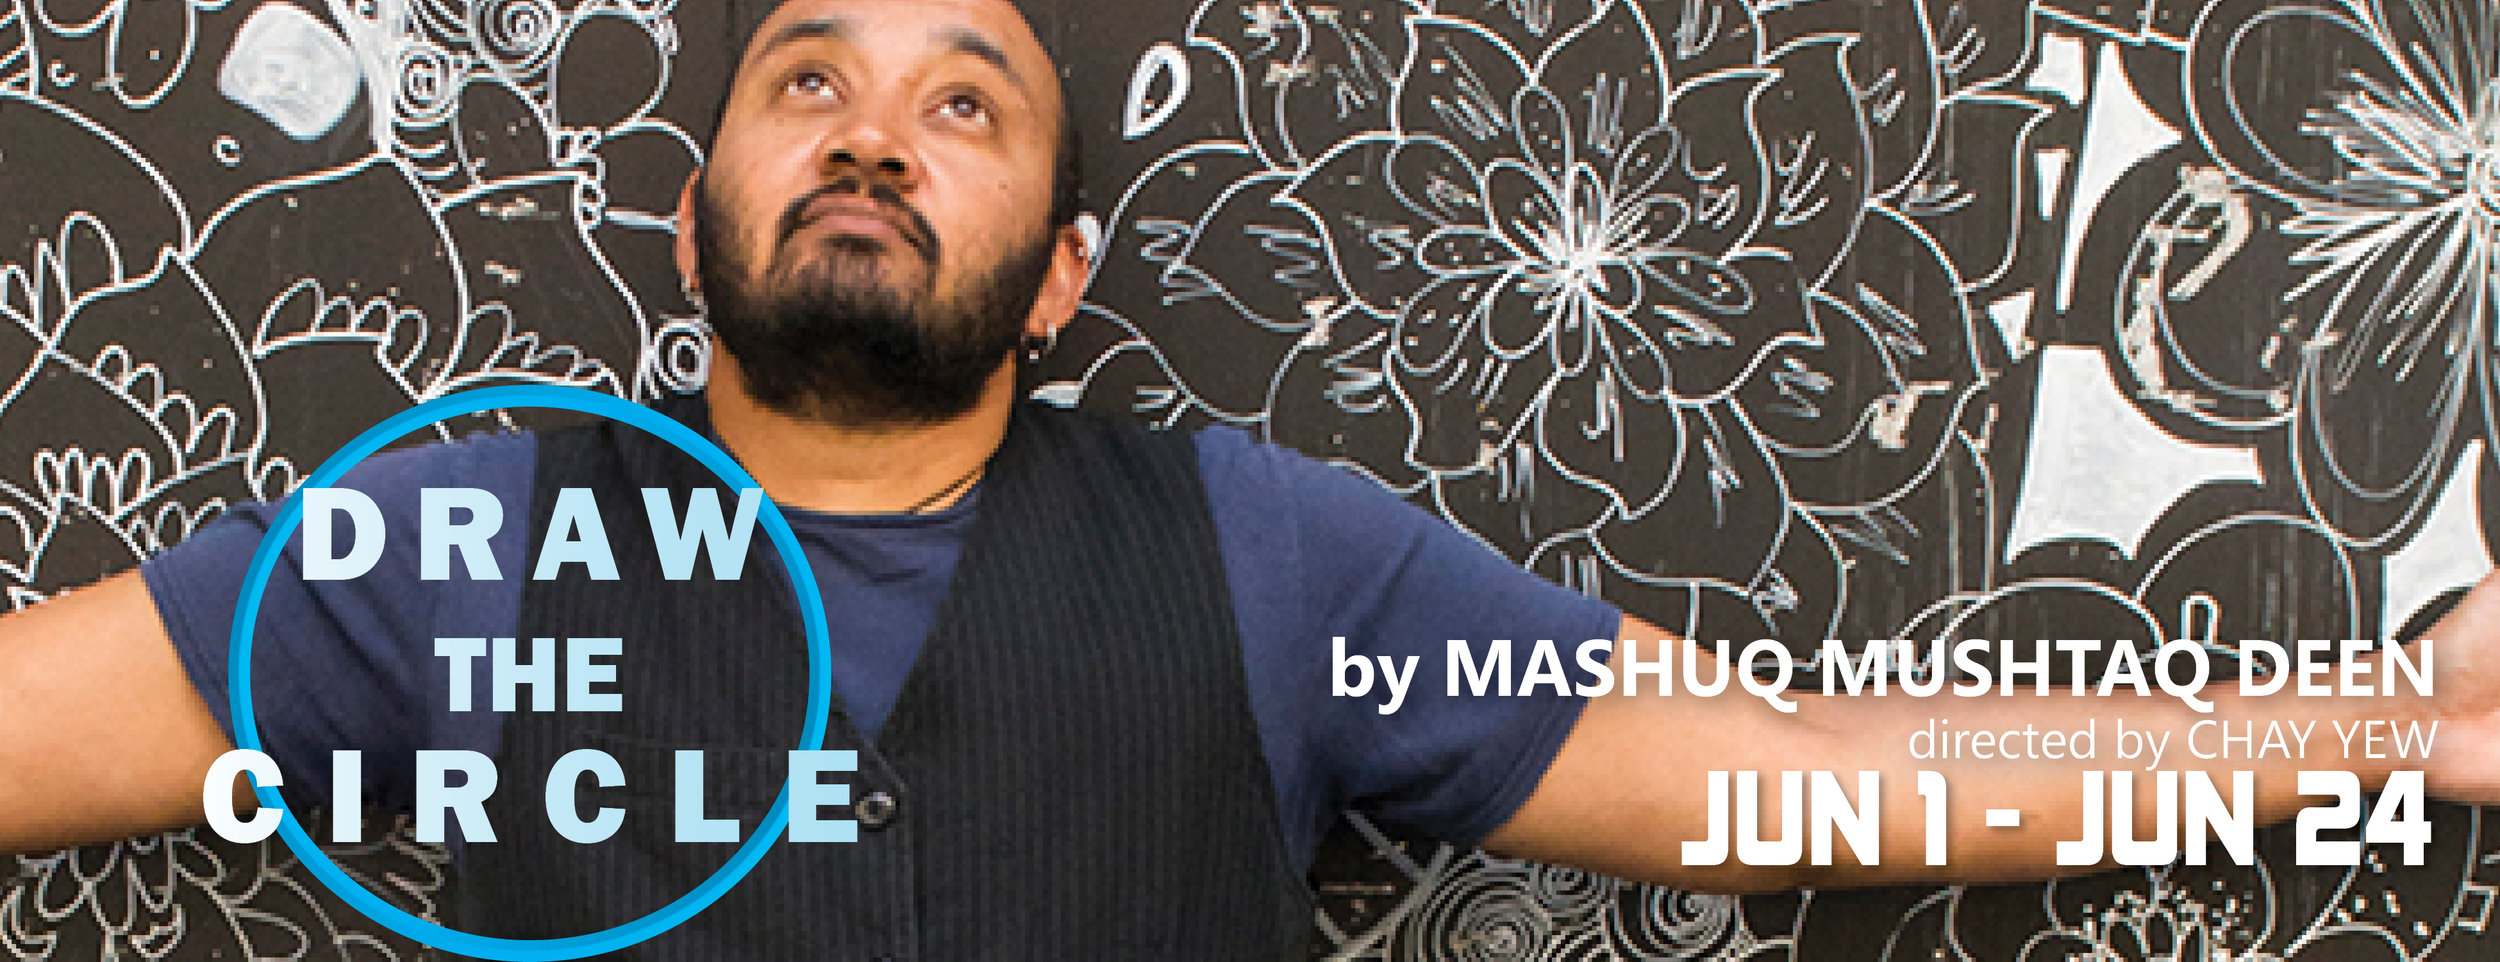 DRAW THE CIRCLE by Mashuq Mushtaq Deen June 1 - June 24